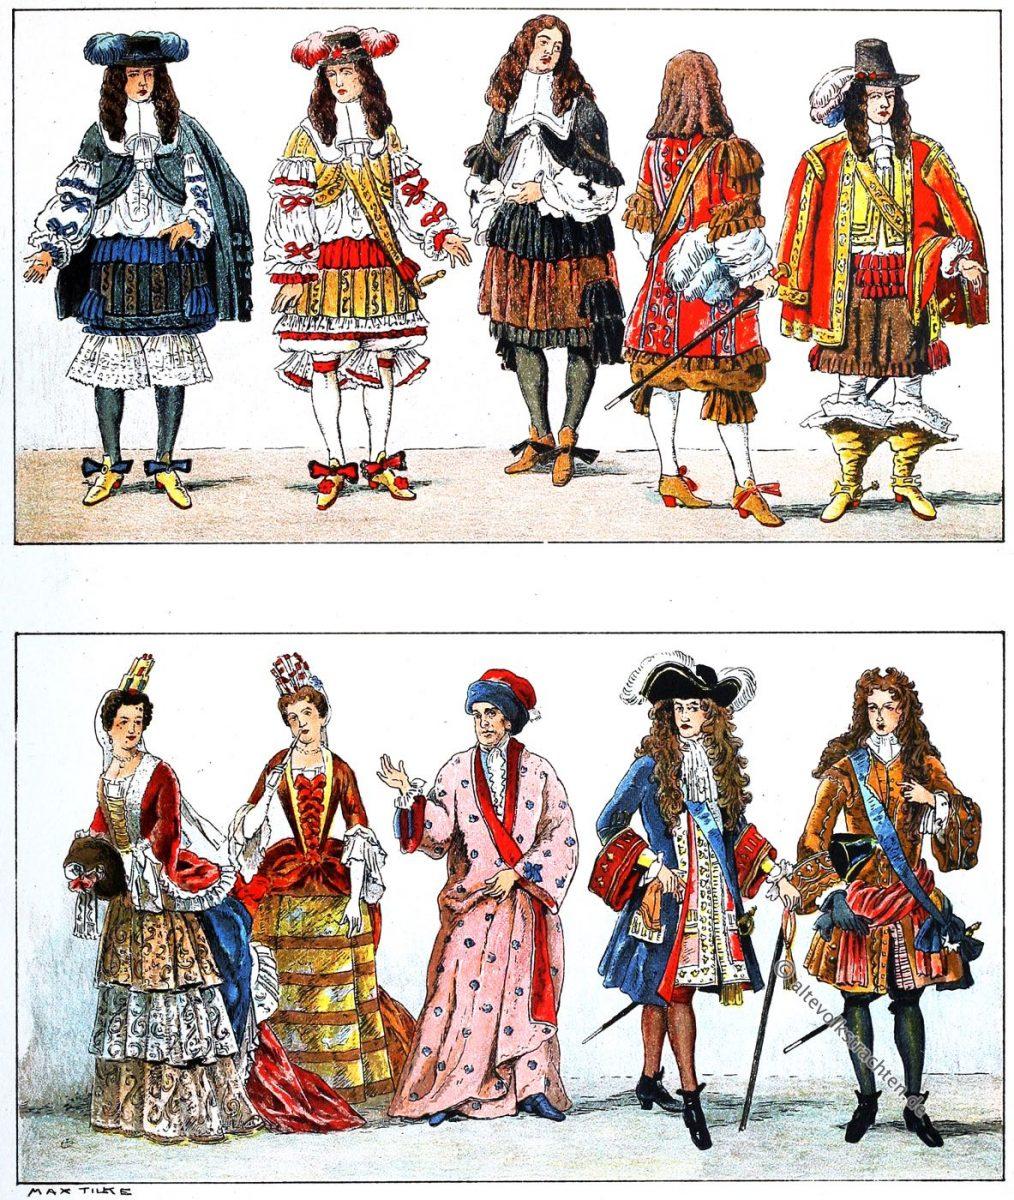 Mode, Ludwig XIV, Frankreich, Barock, Kostümgeschichte, Adolf Rosenberg, Eduard Heyck,